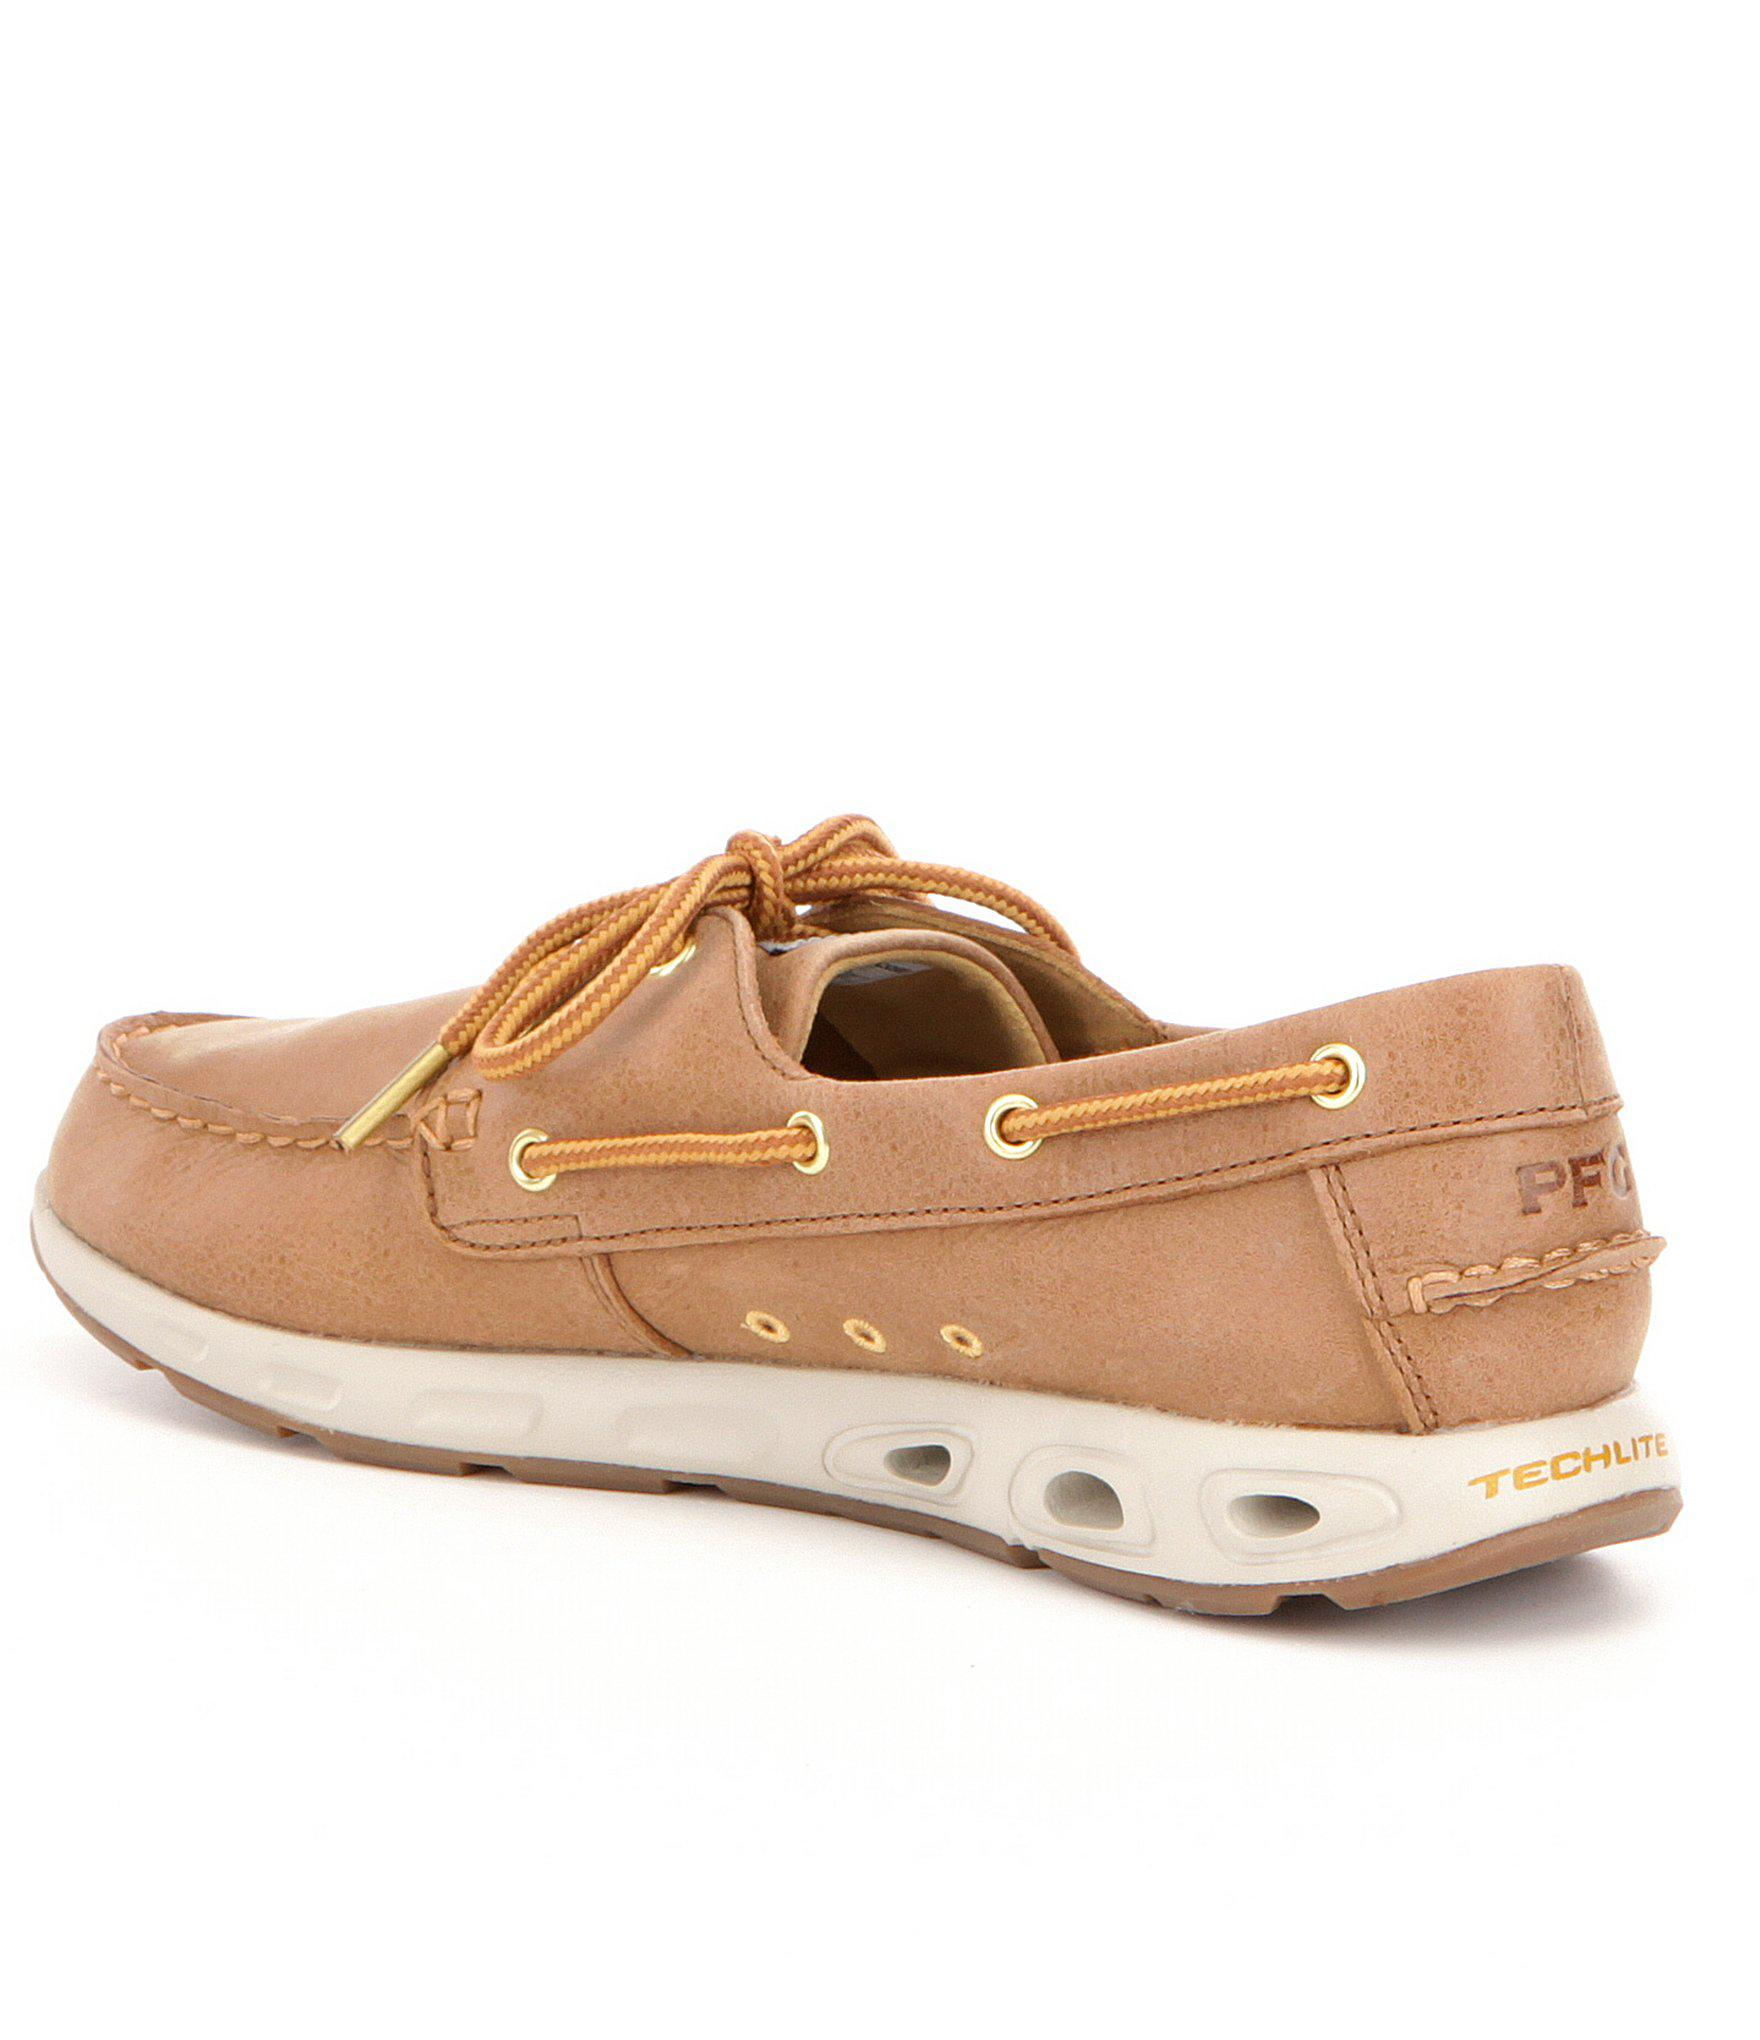 Pfg Schuhe Mens Boat Bonehead Vent Herren Columbia Shoes ZuTOiPkX